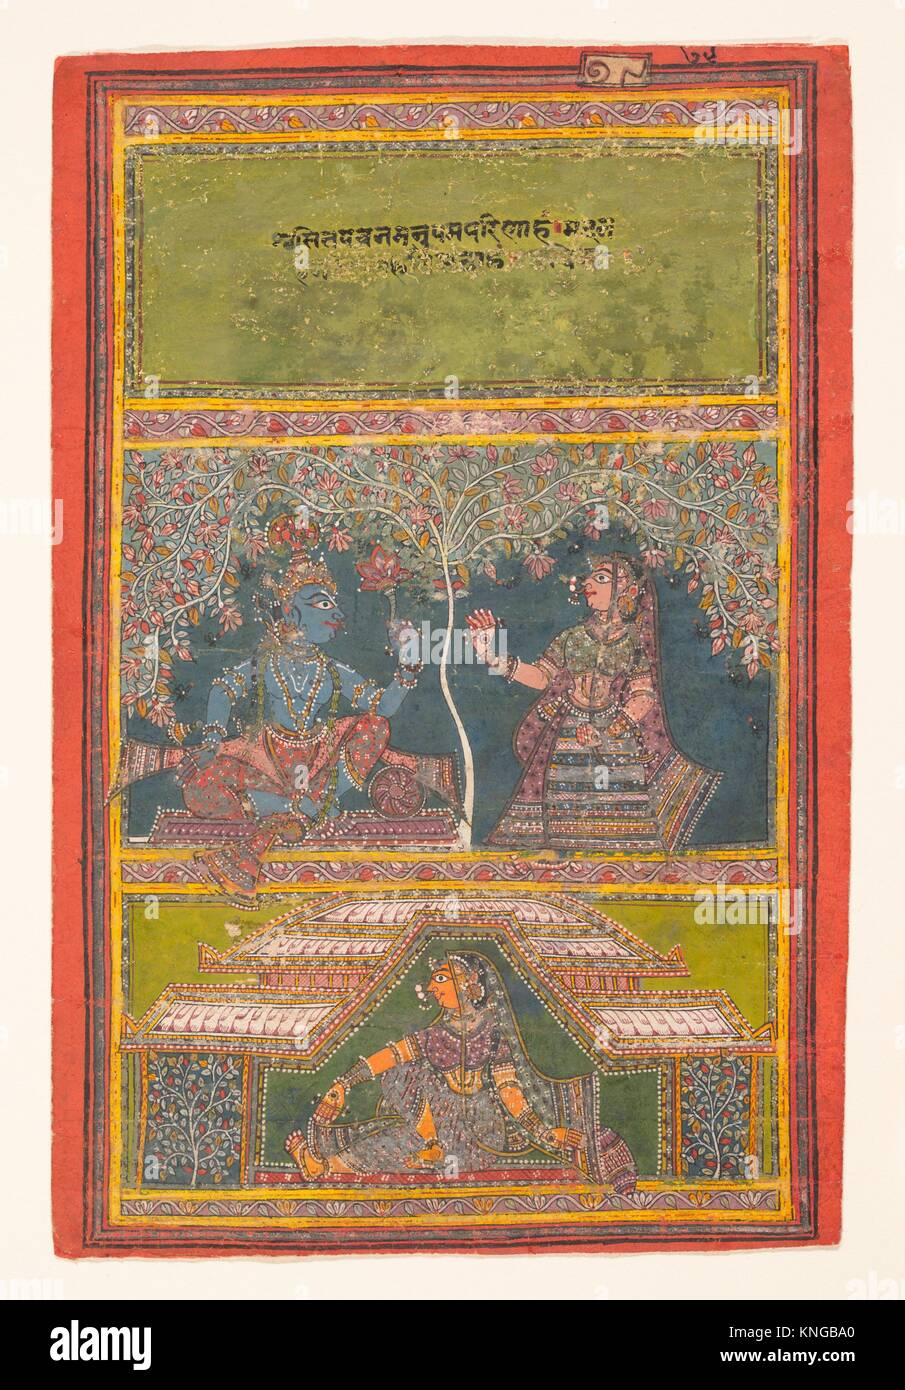 Krishna and Radha Conversing: Page from a Dispersed Gita Govinda (Loves of Krishna). Date: 18th century; Culture: - Stock Image